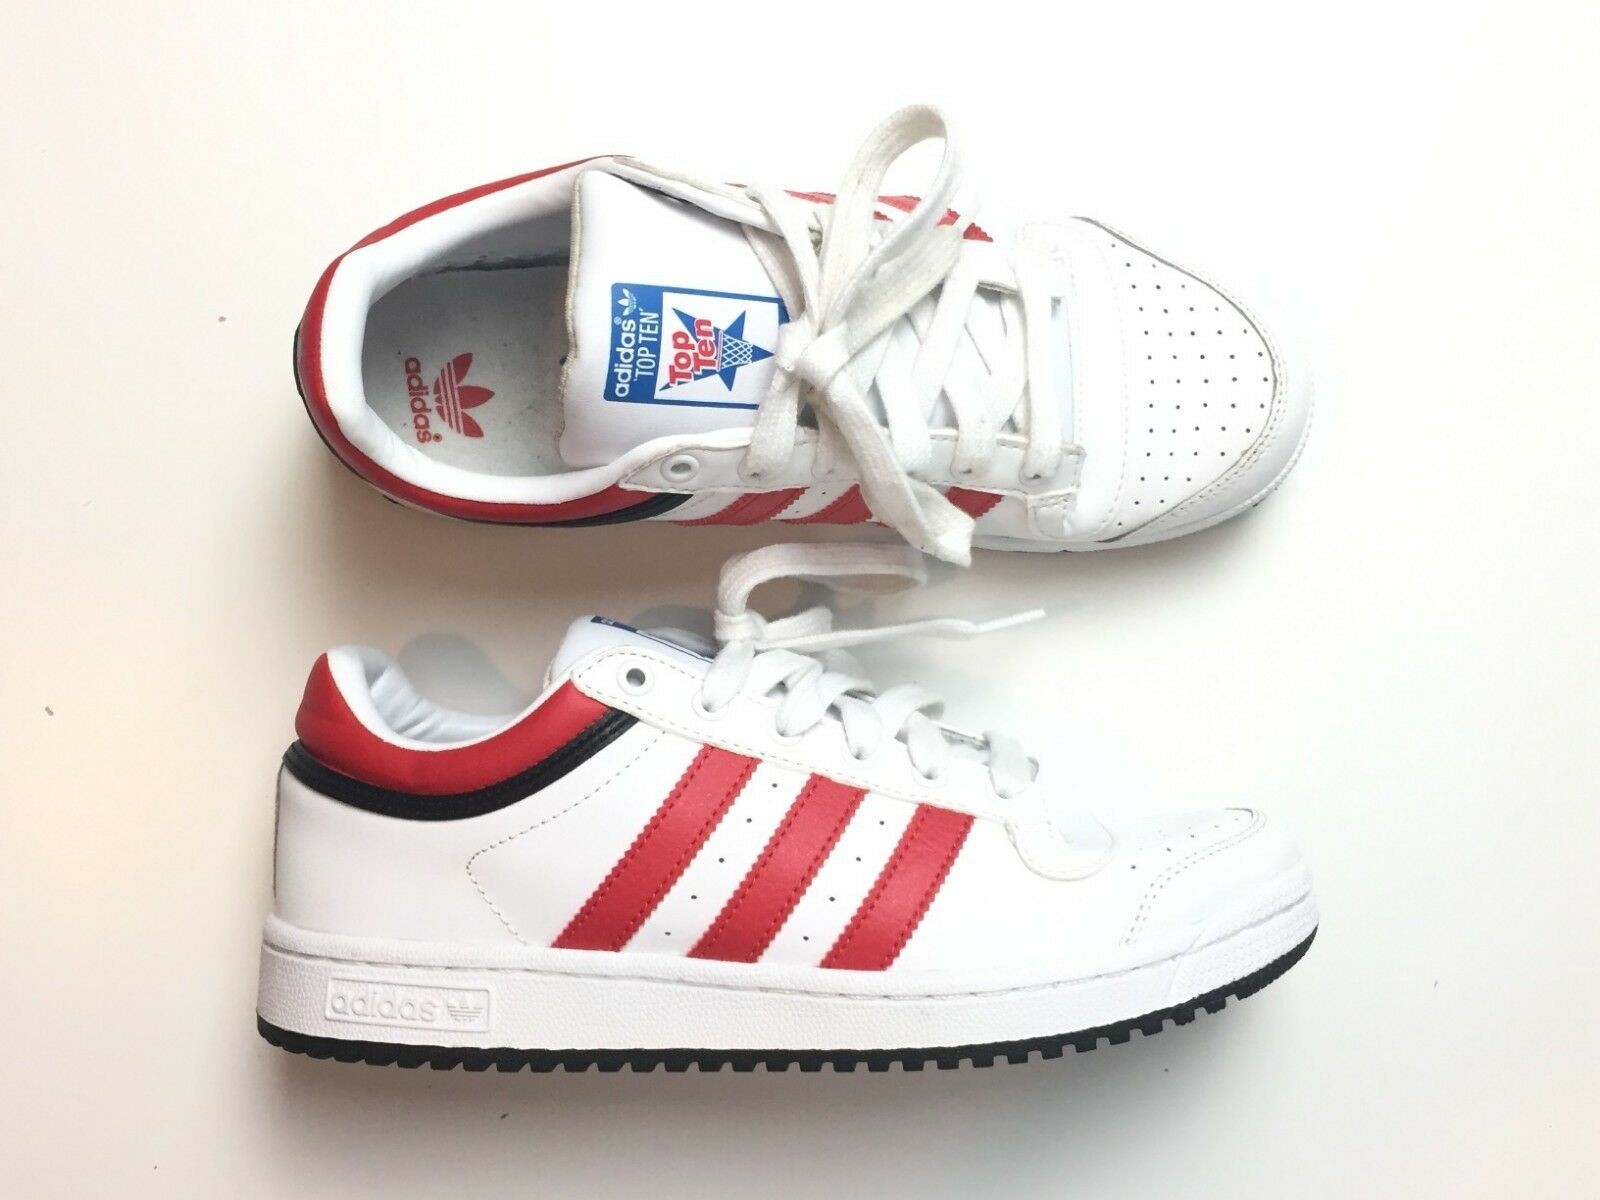 Adidas top ten lo shoes size 6.5 Cheap and beautiful fashion